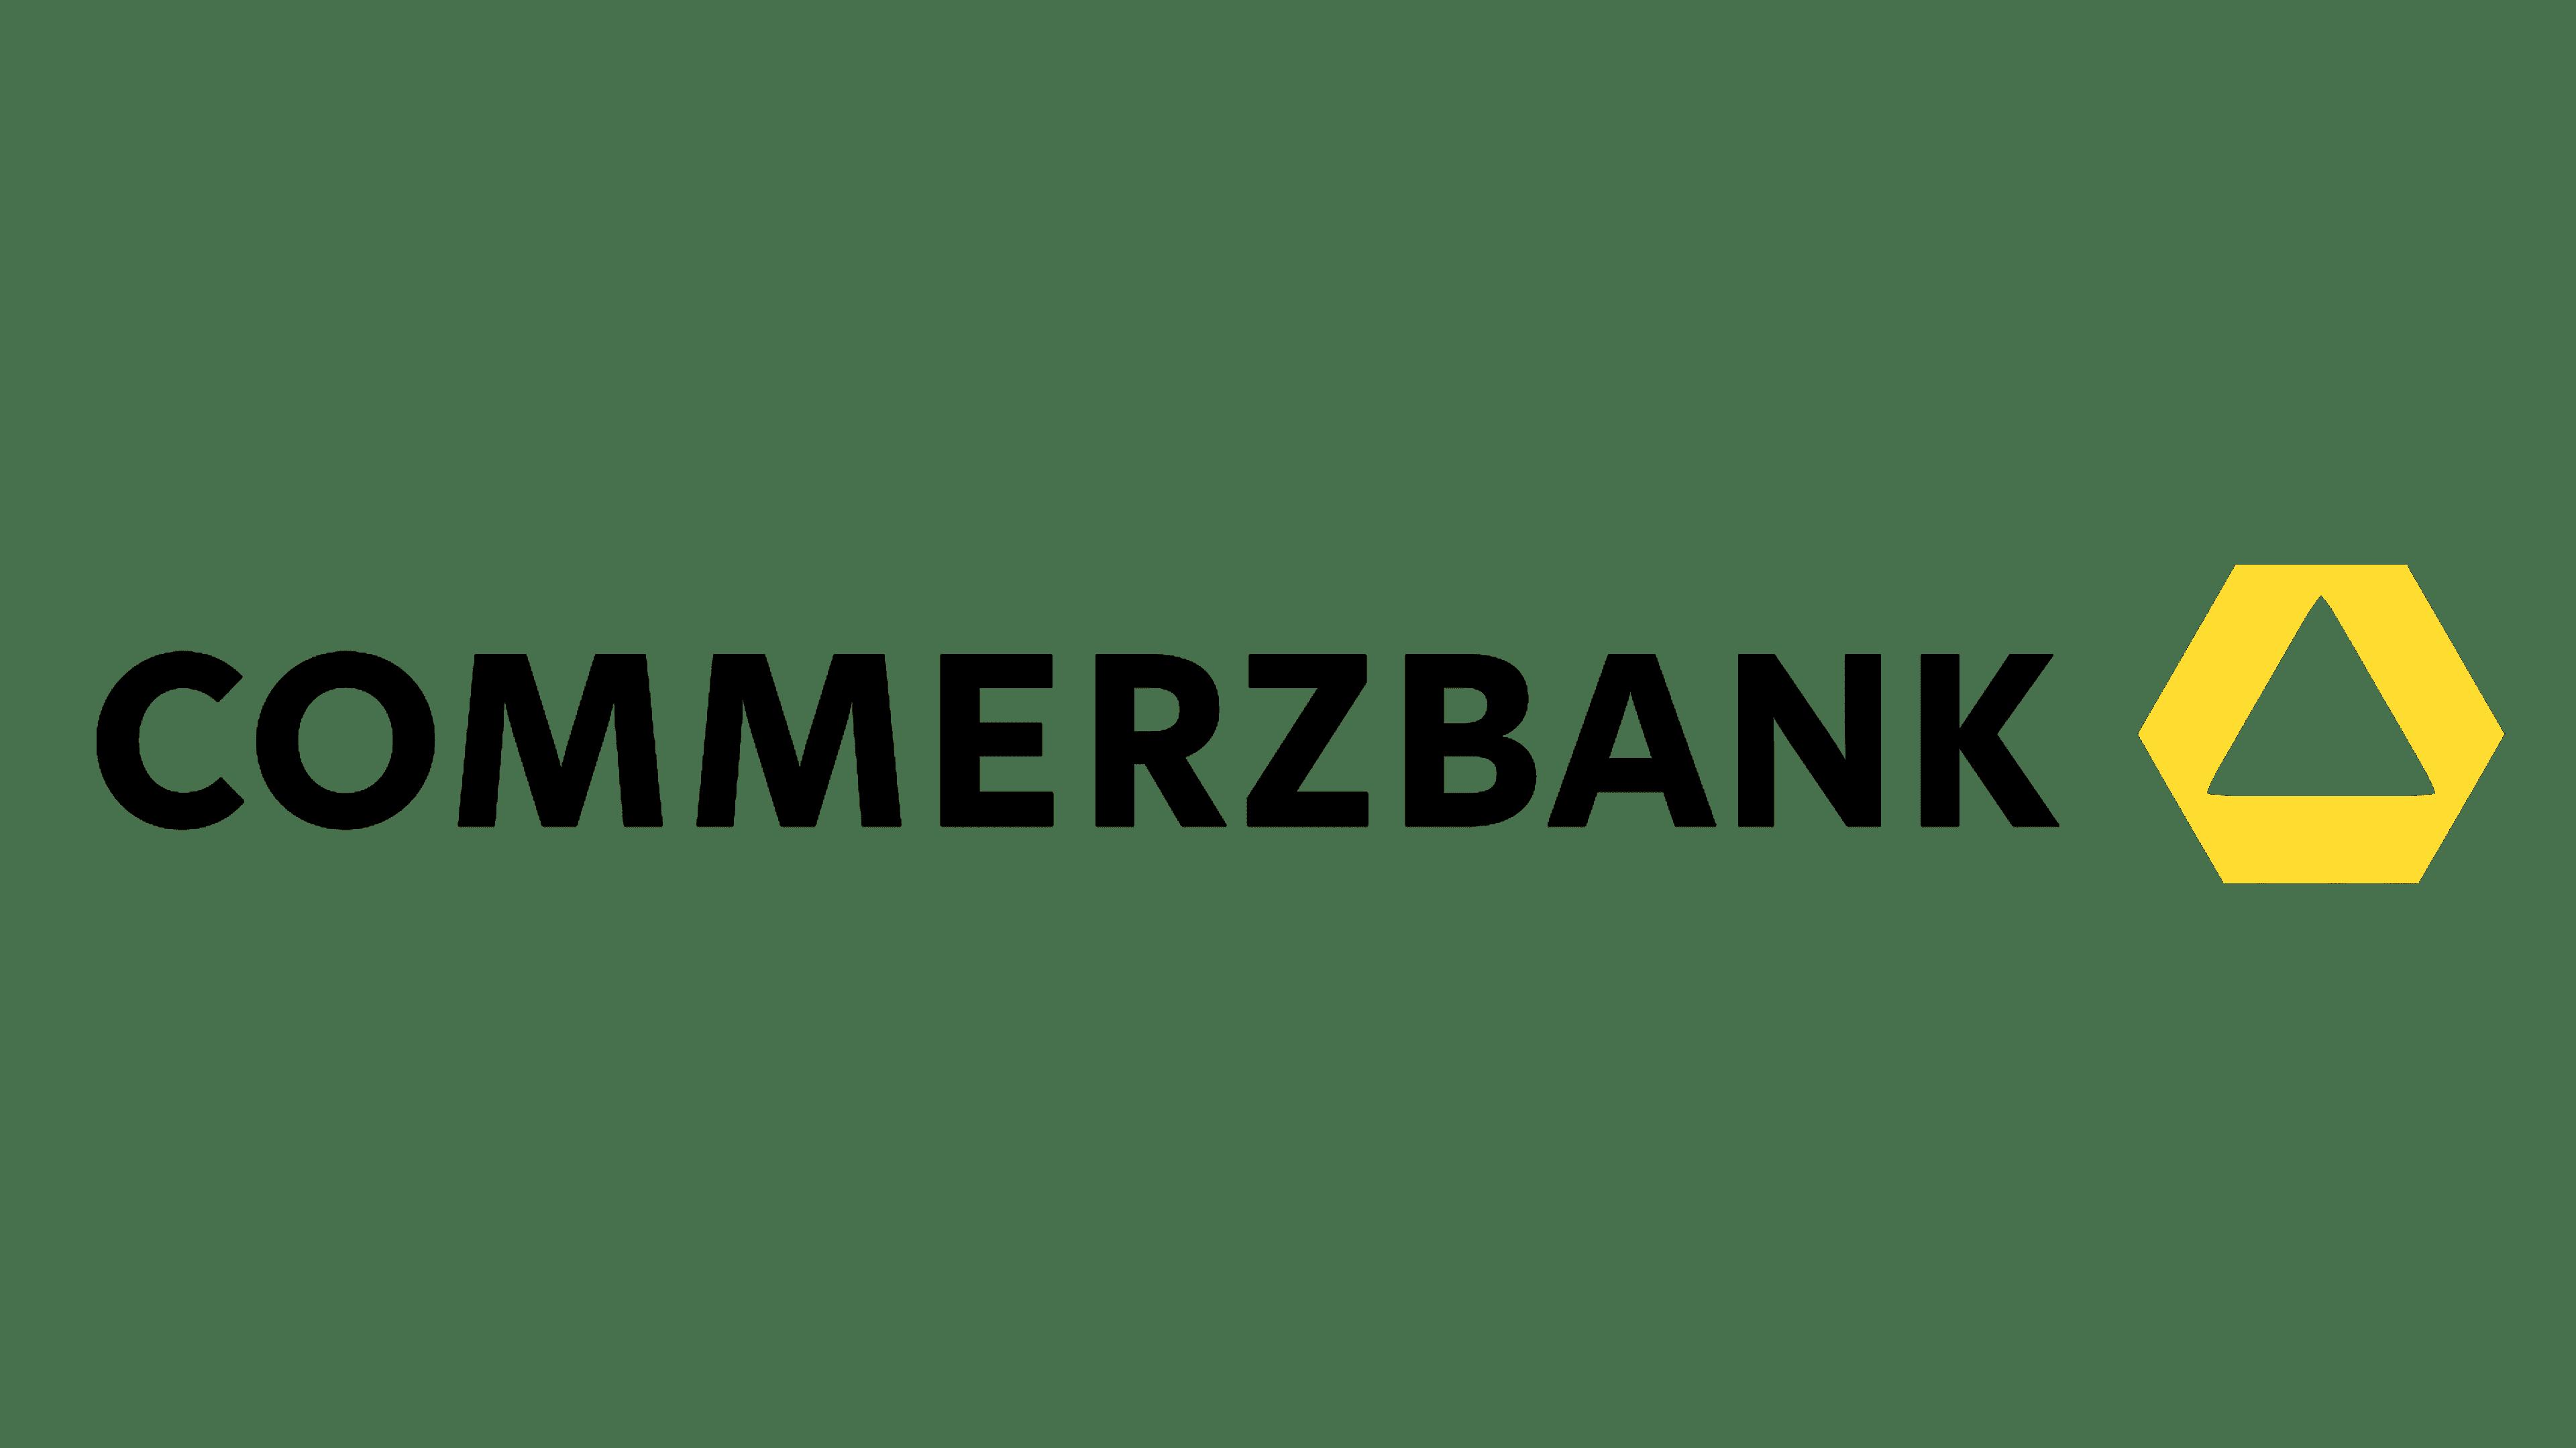 Commerzbank Logo Logo